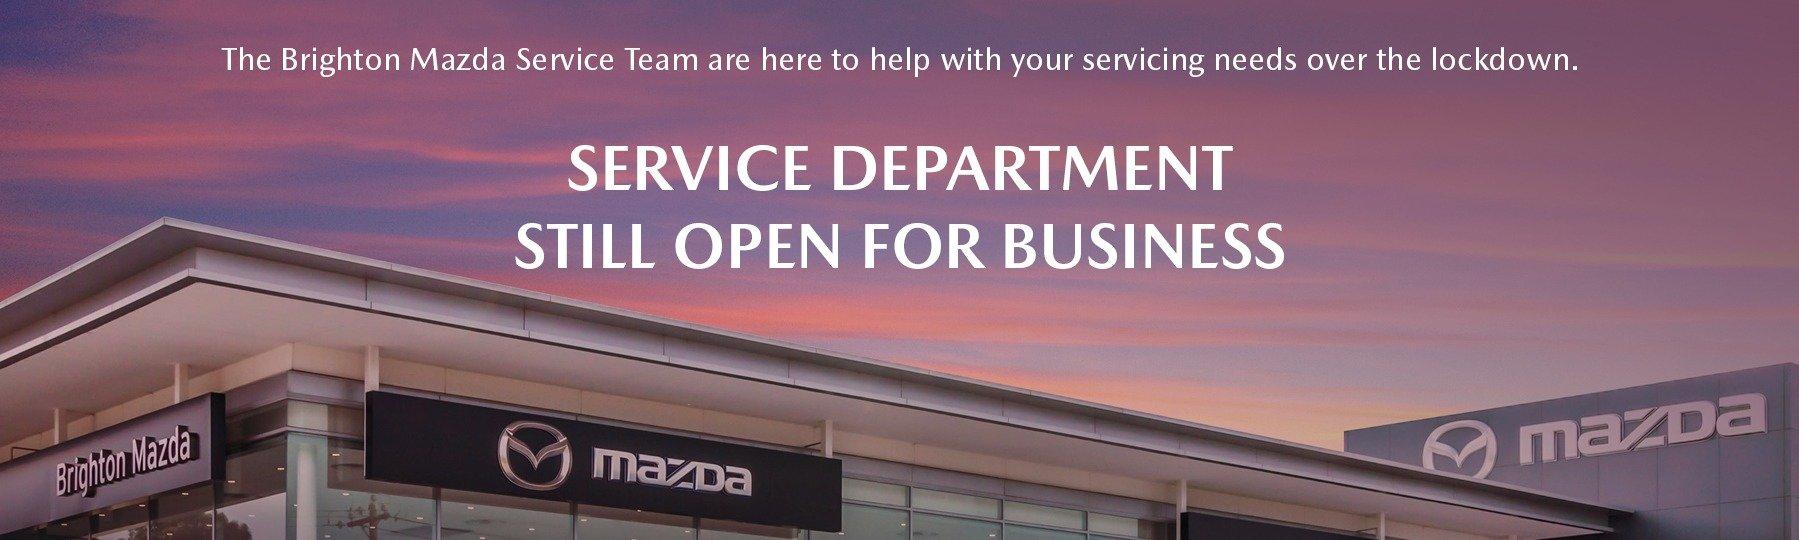 Service Department is Still Open